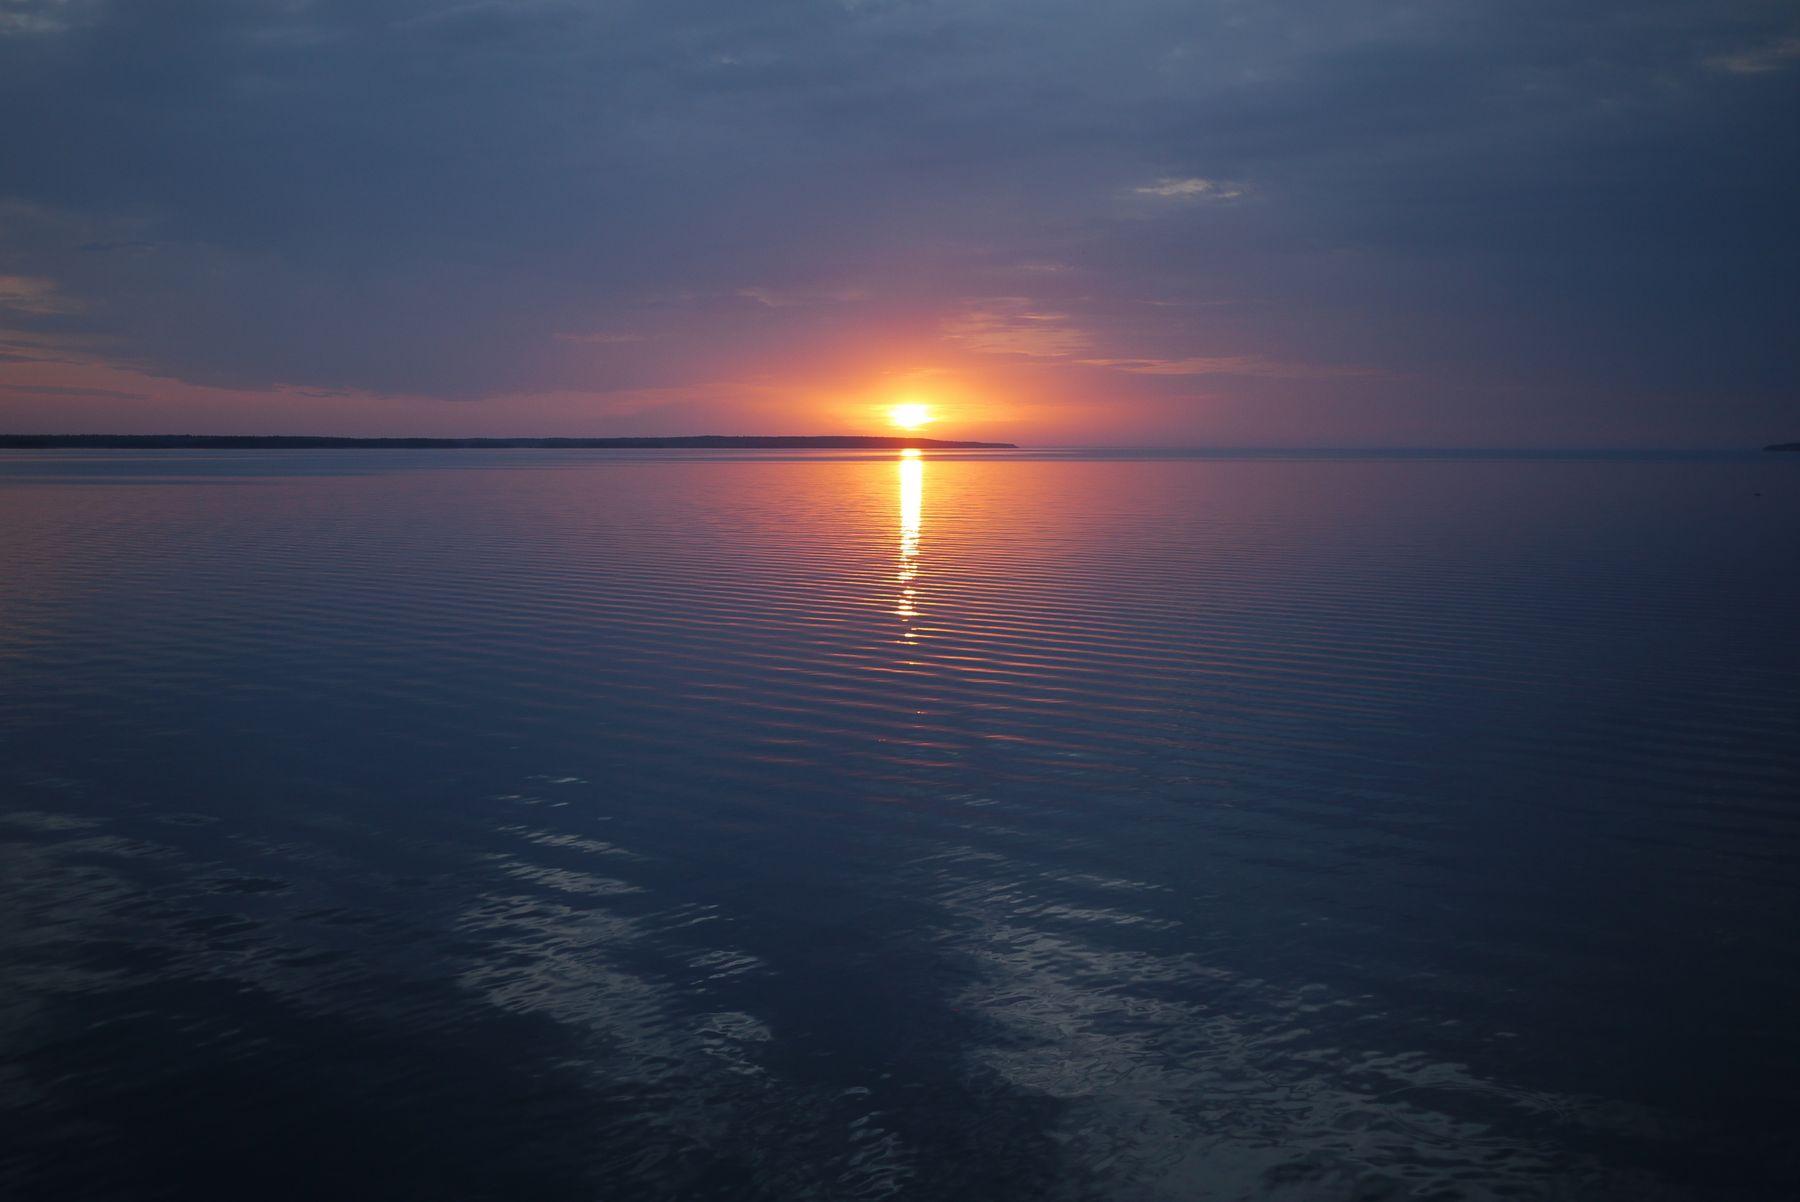 *** Закат небо море отражение облака горизонт заря природа вода